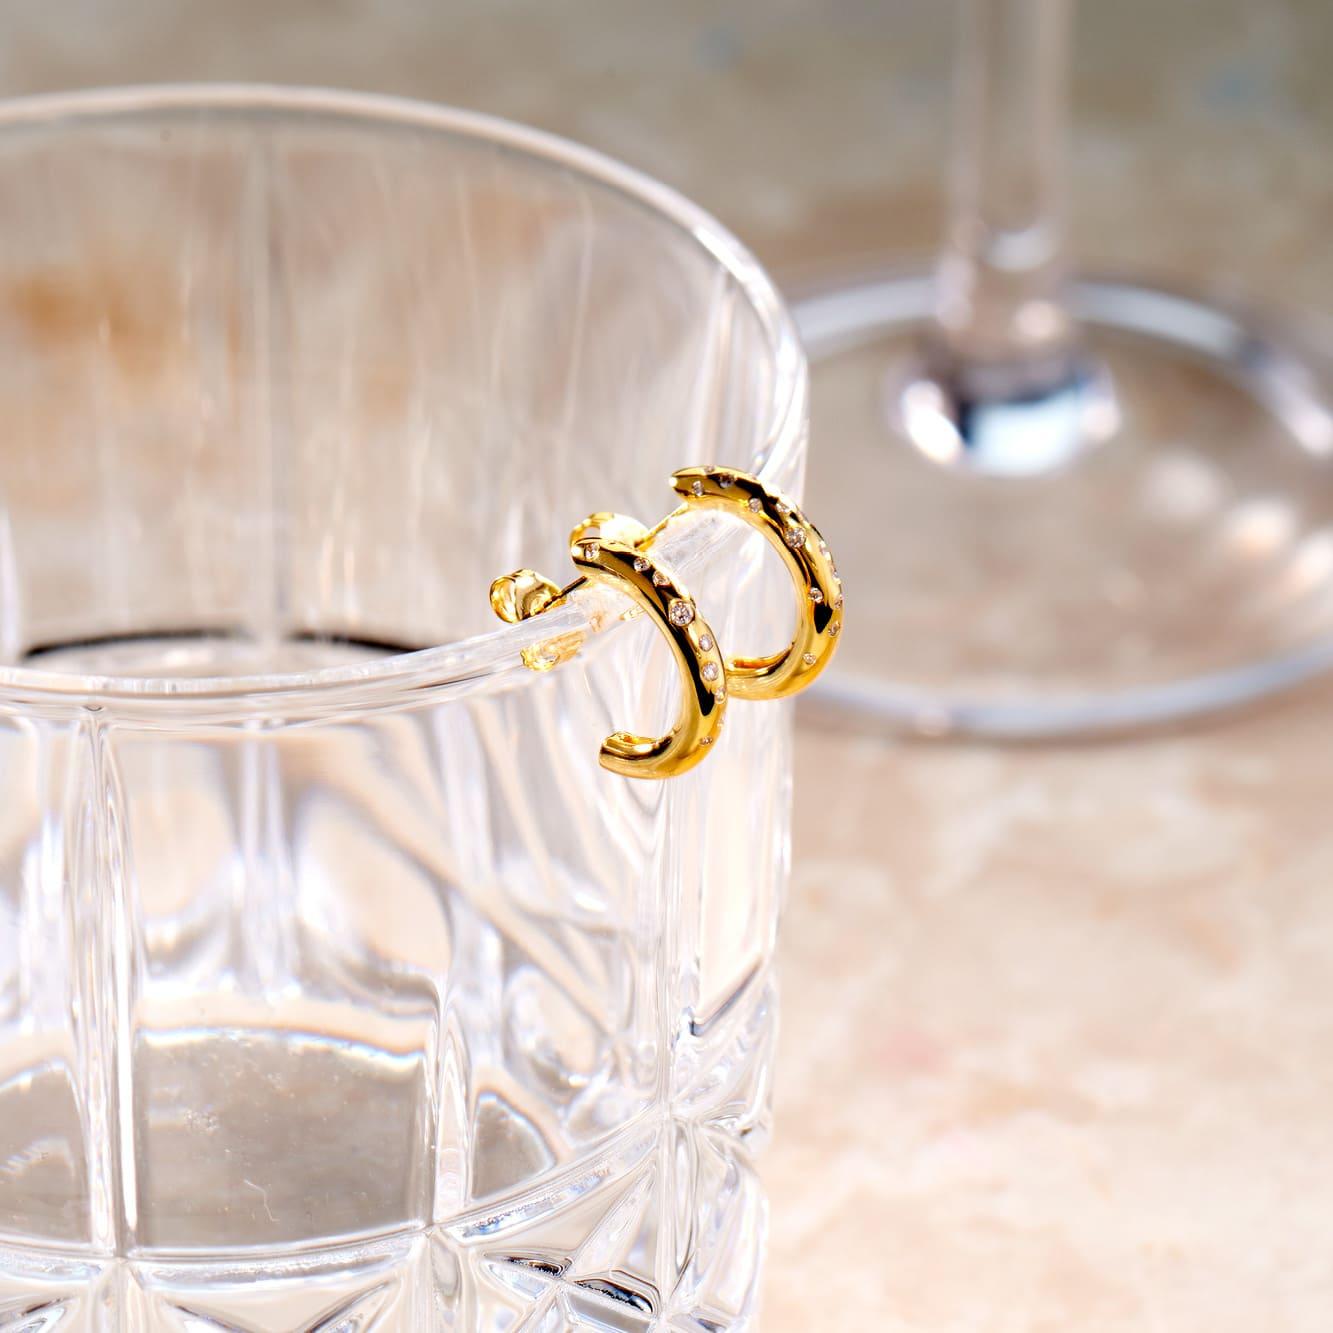 Damen Steckcreolen Gold 375 Diamanten 0,18ct